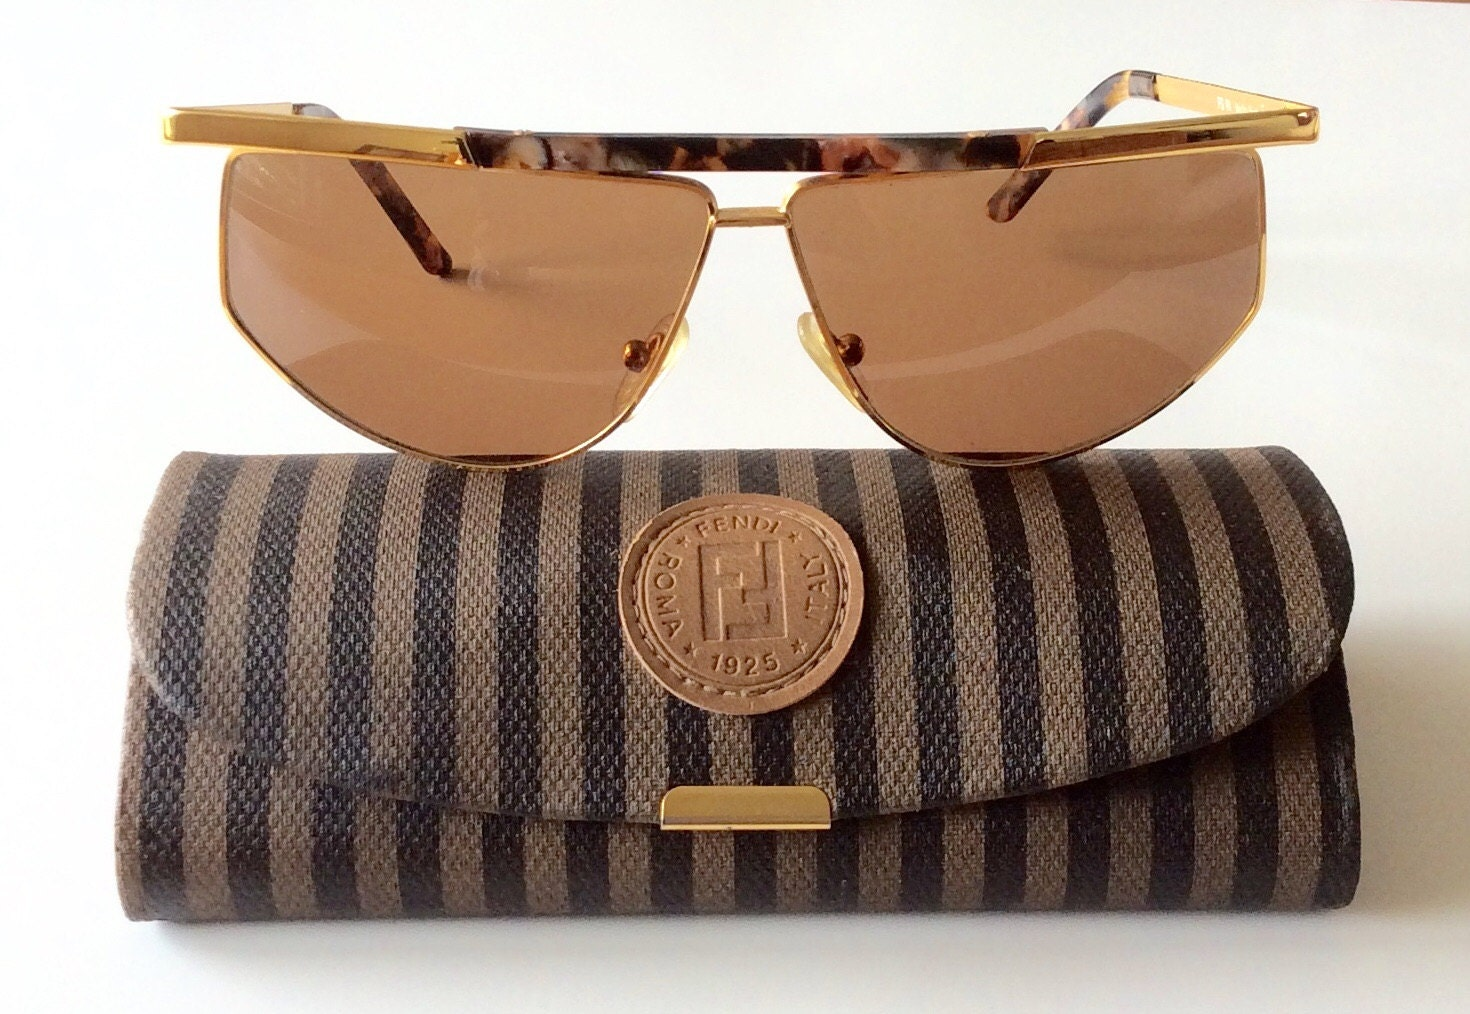 Designer Eyeglass Cases For Women David Simchi Levi